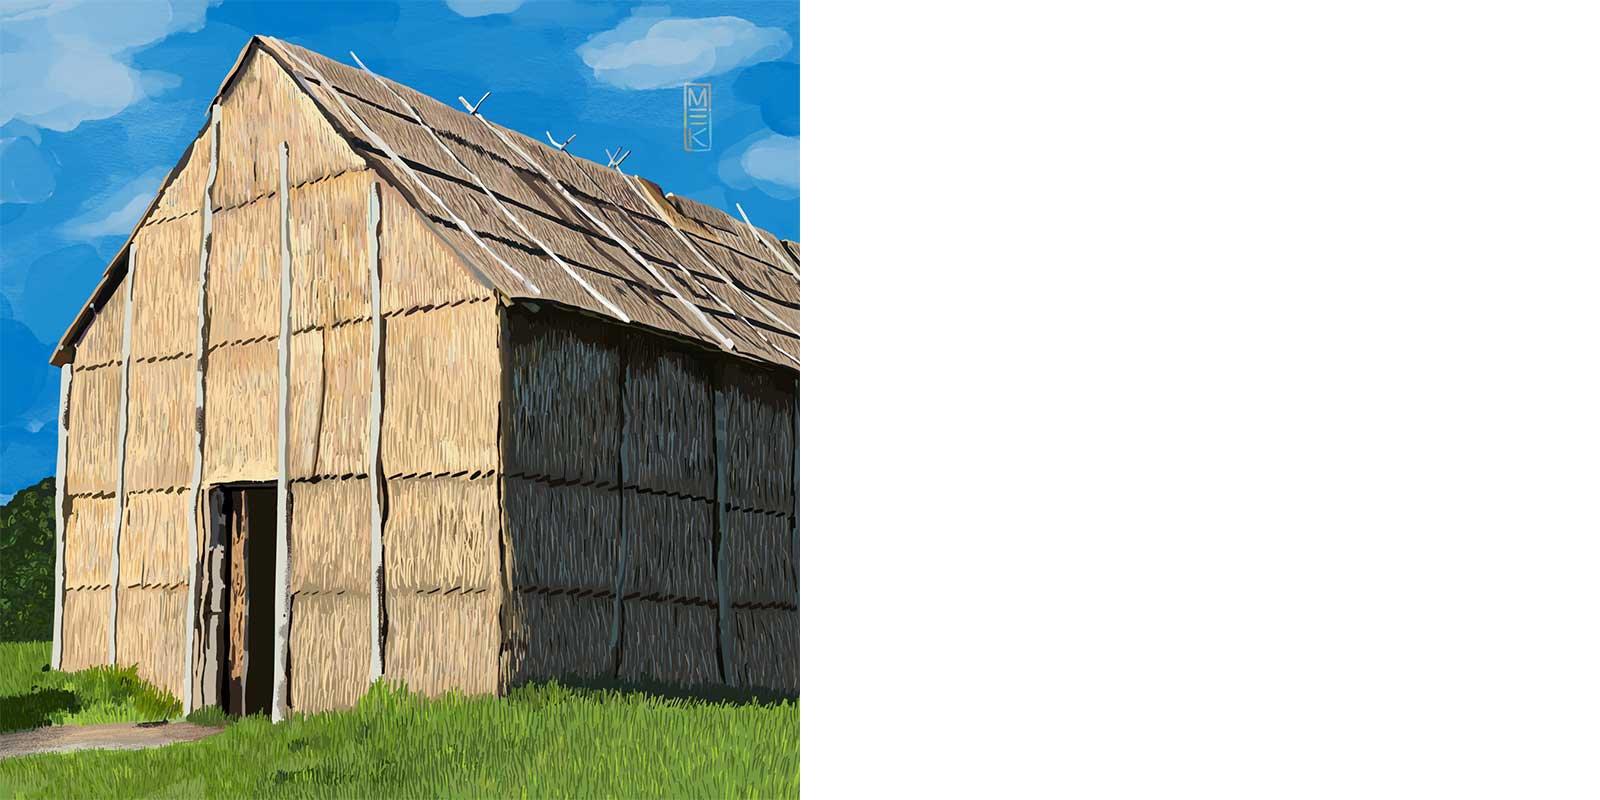 Illustration by Mek Frinchaboy of the Longhouse at Ganondagan in Victor, NY